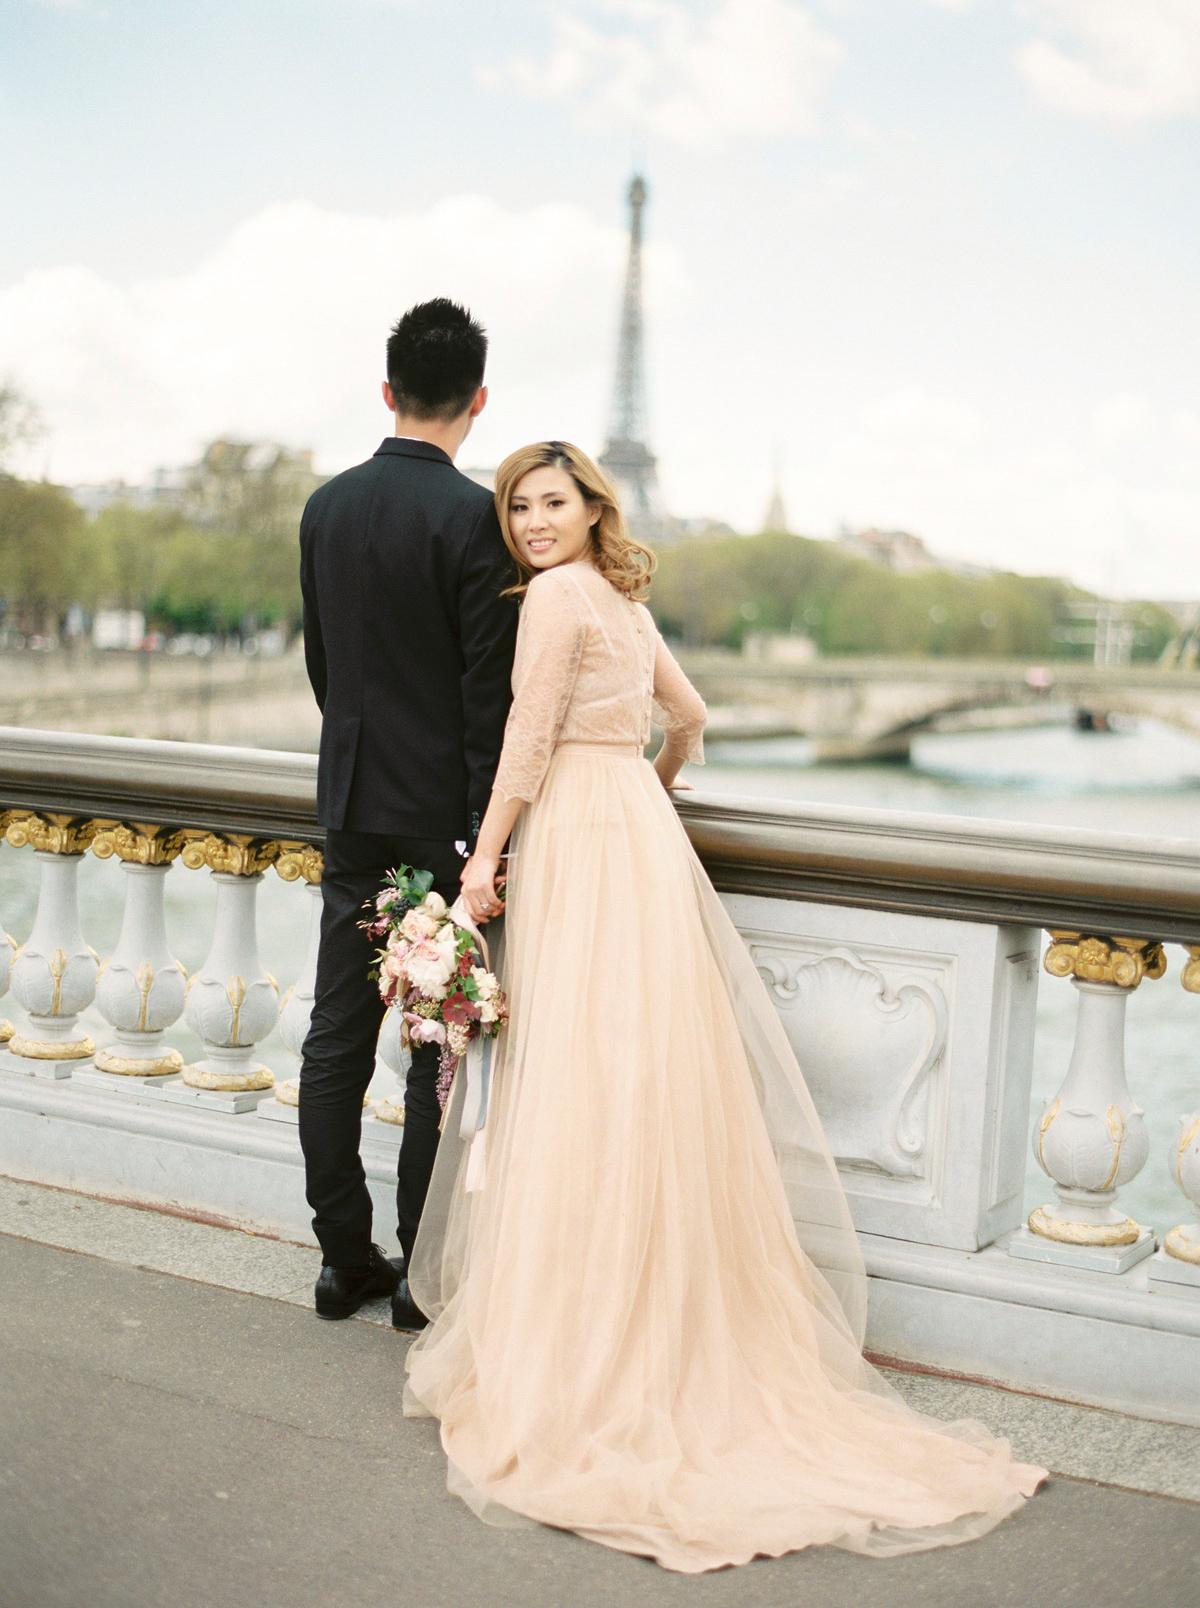 97aeab8579e A Dreamy Engagement Shoot in Paris Shot On Film | Love My Dress® UK ...